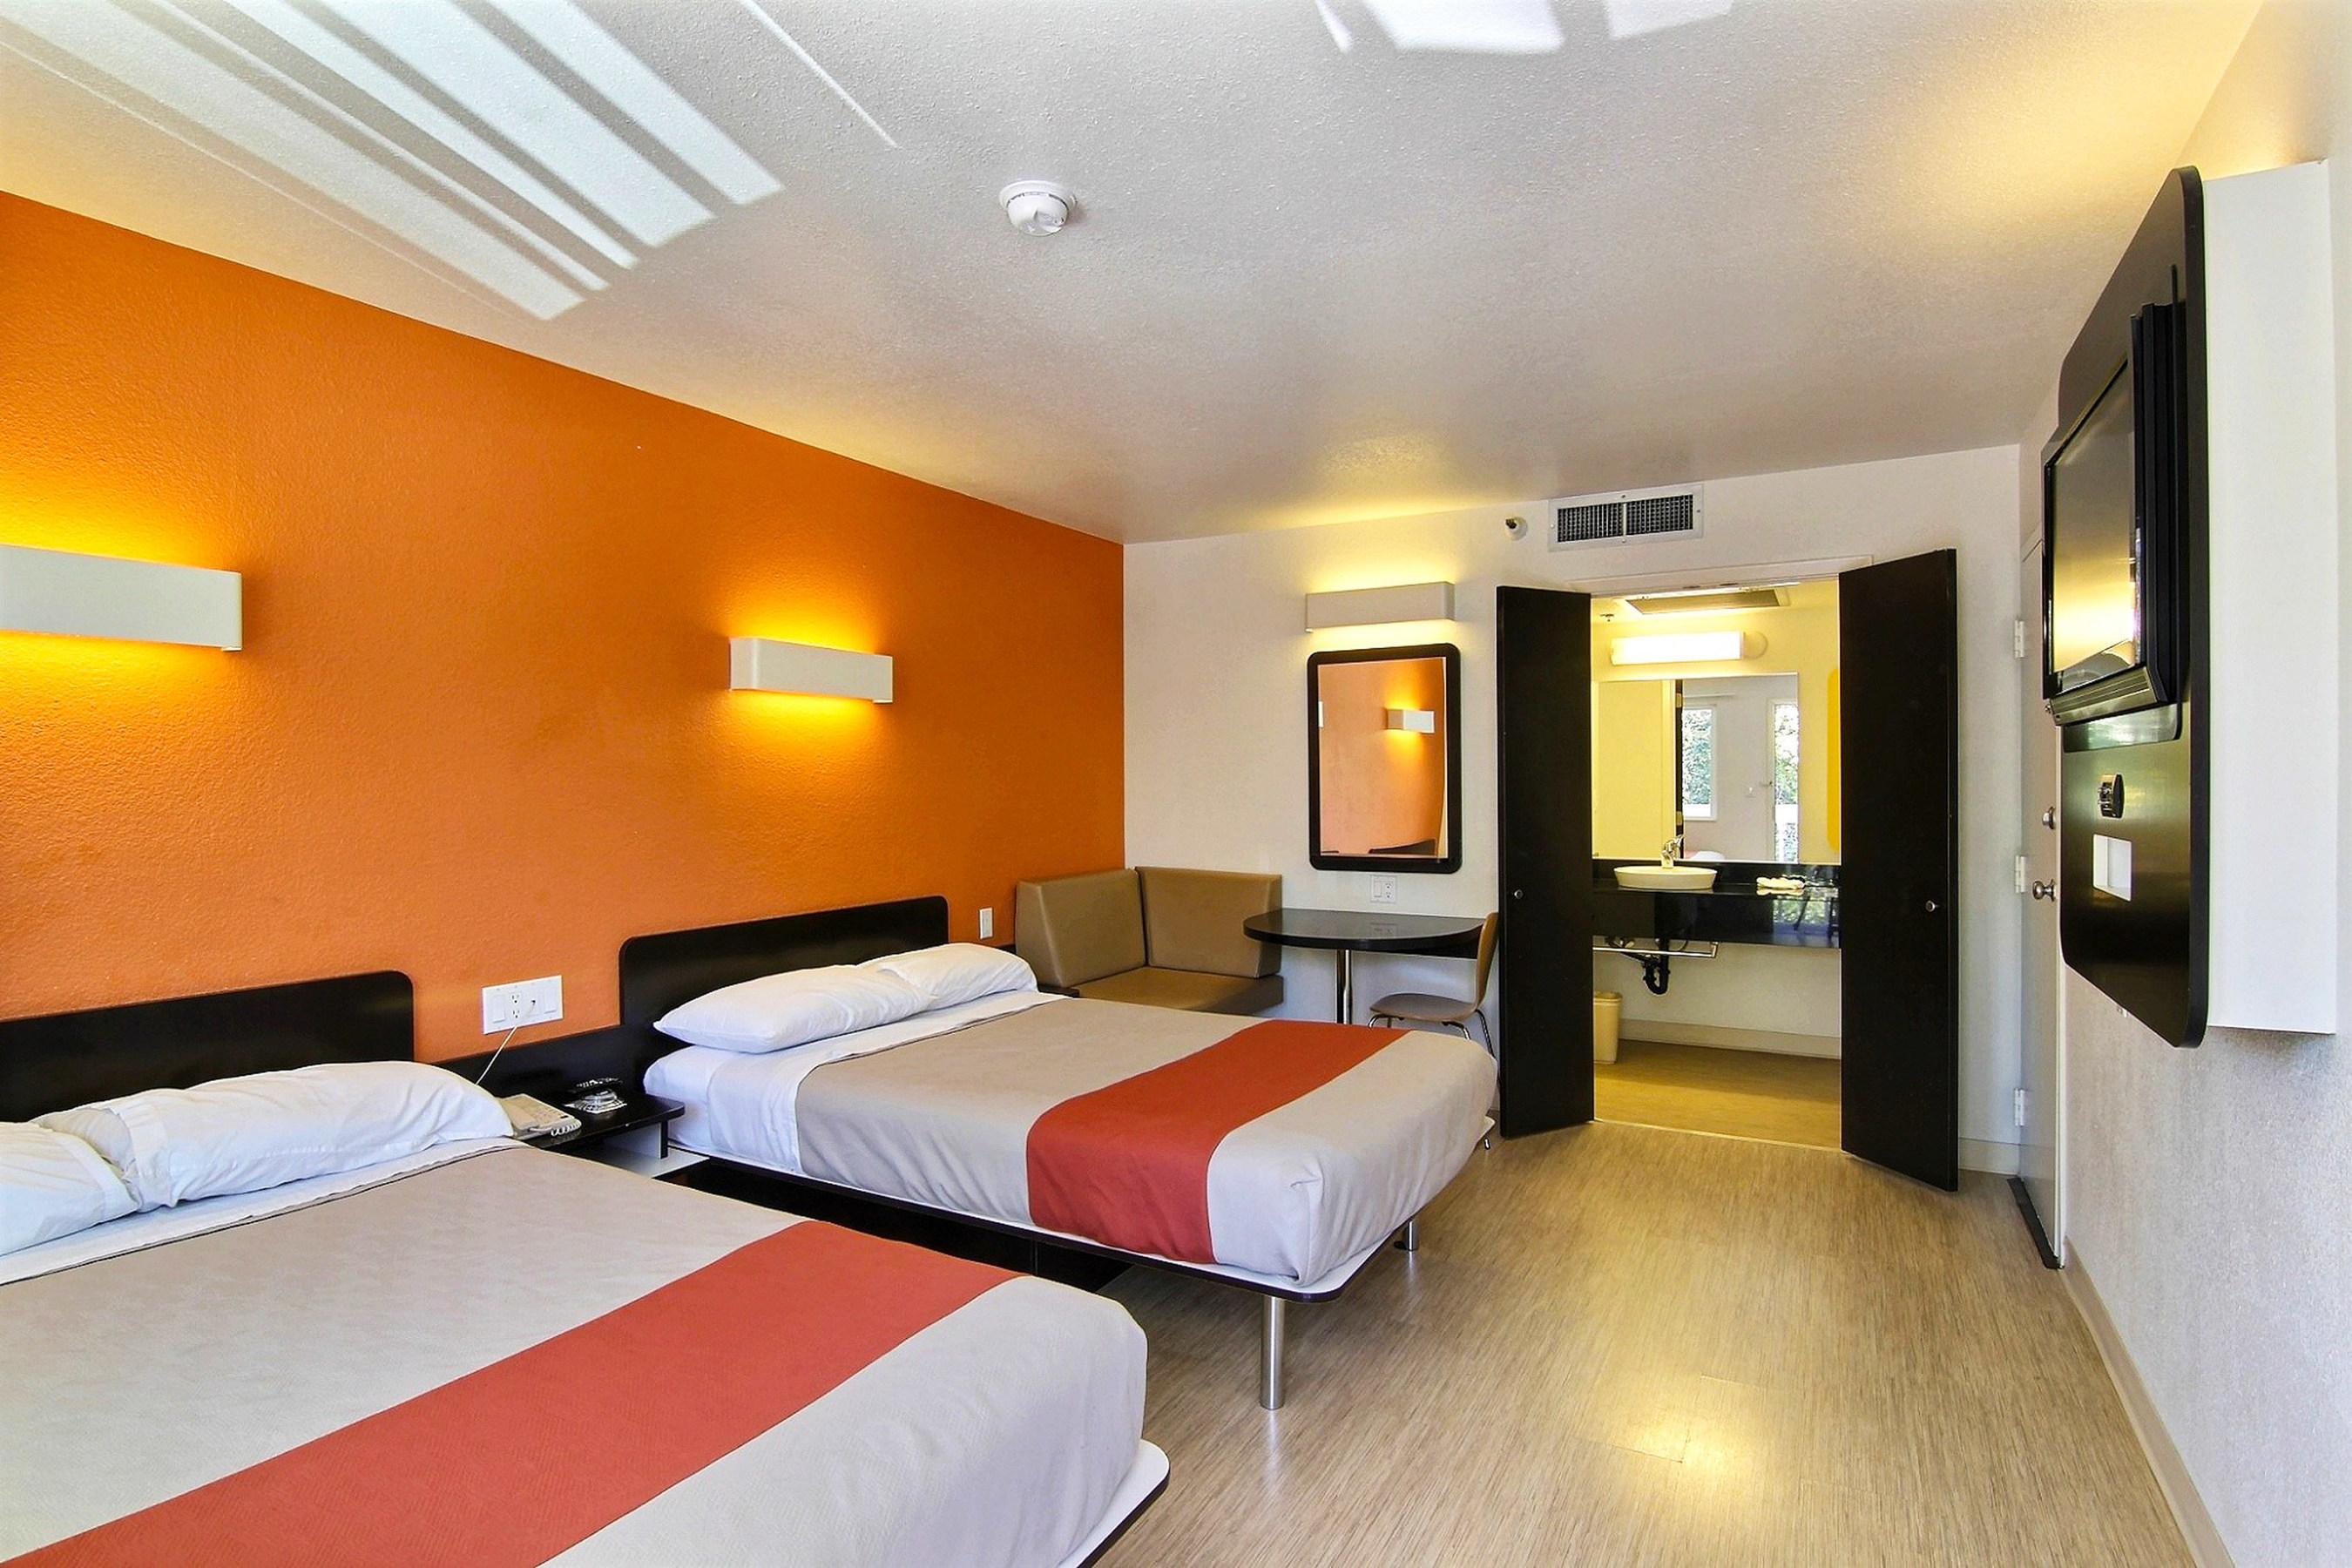 Renovated Motel 6 Room.